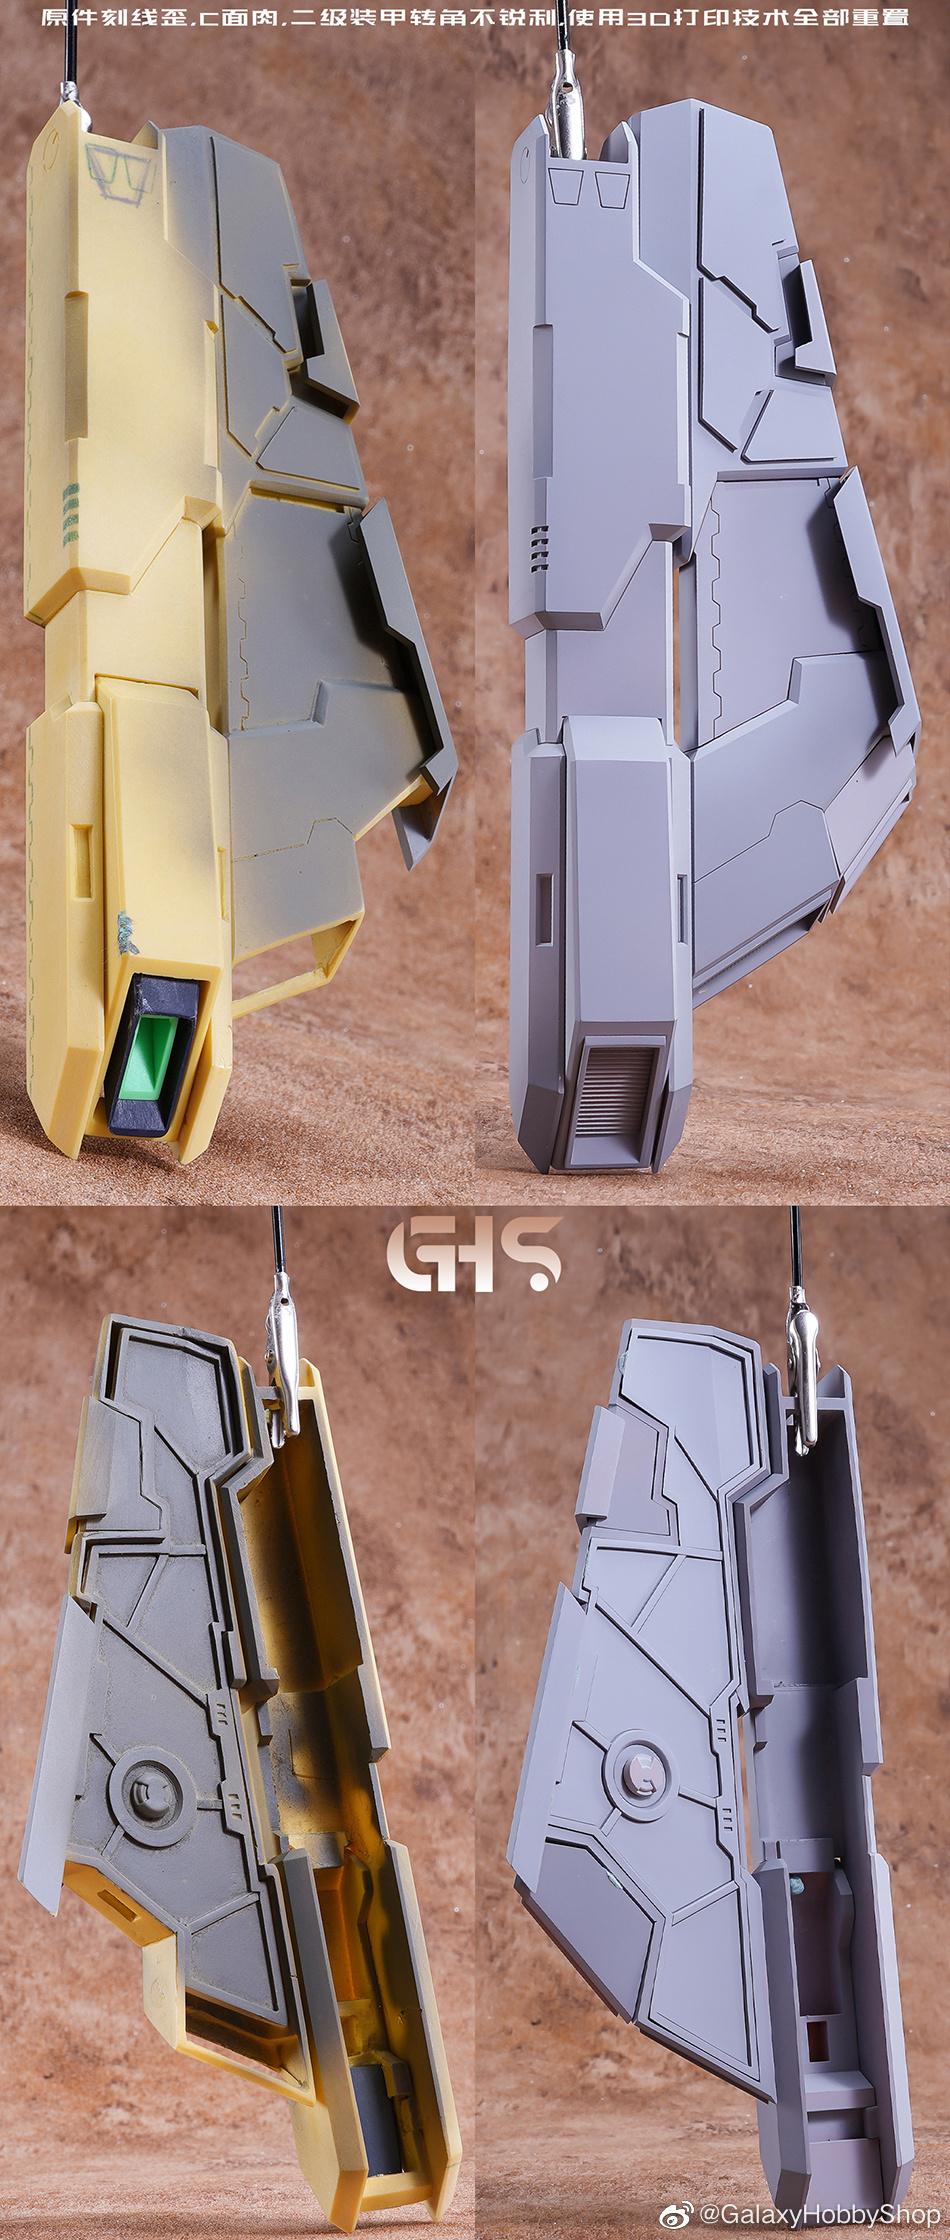 G871_GS_GSH_the_o_GK_003.jpg